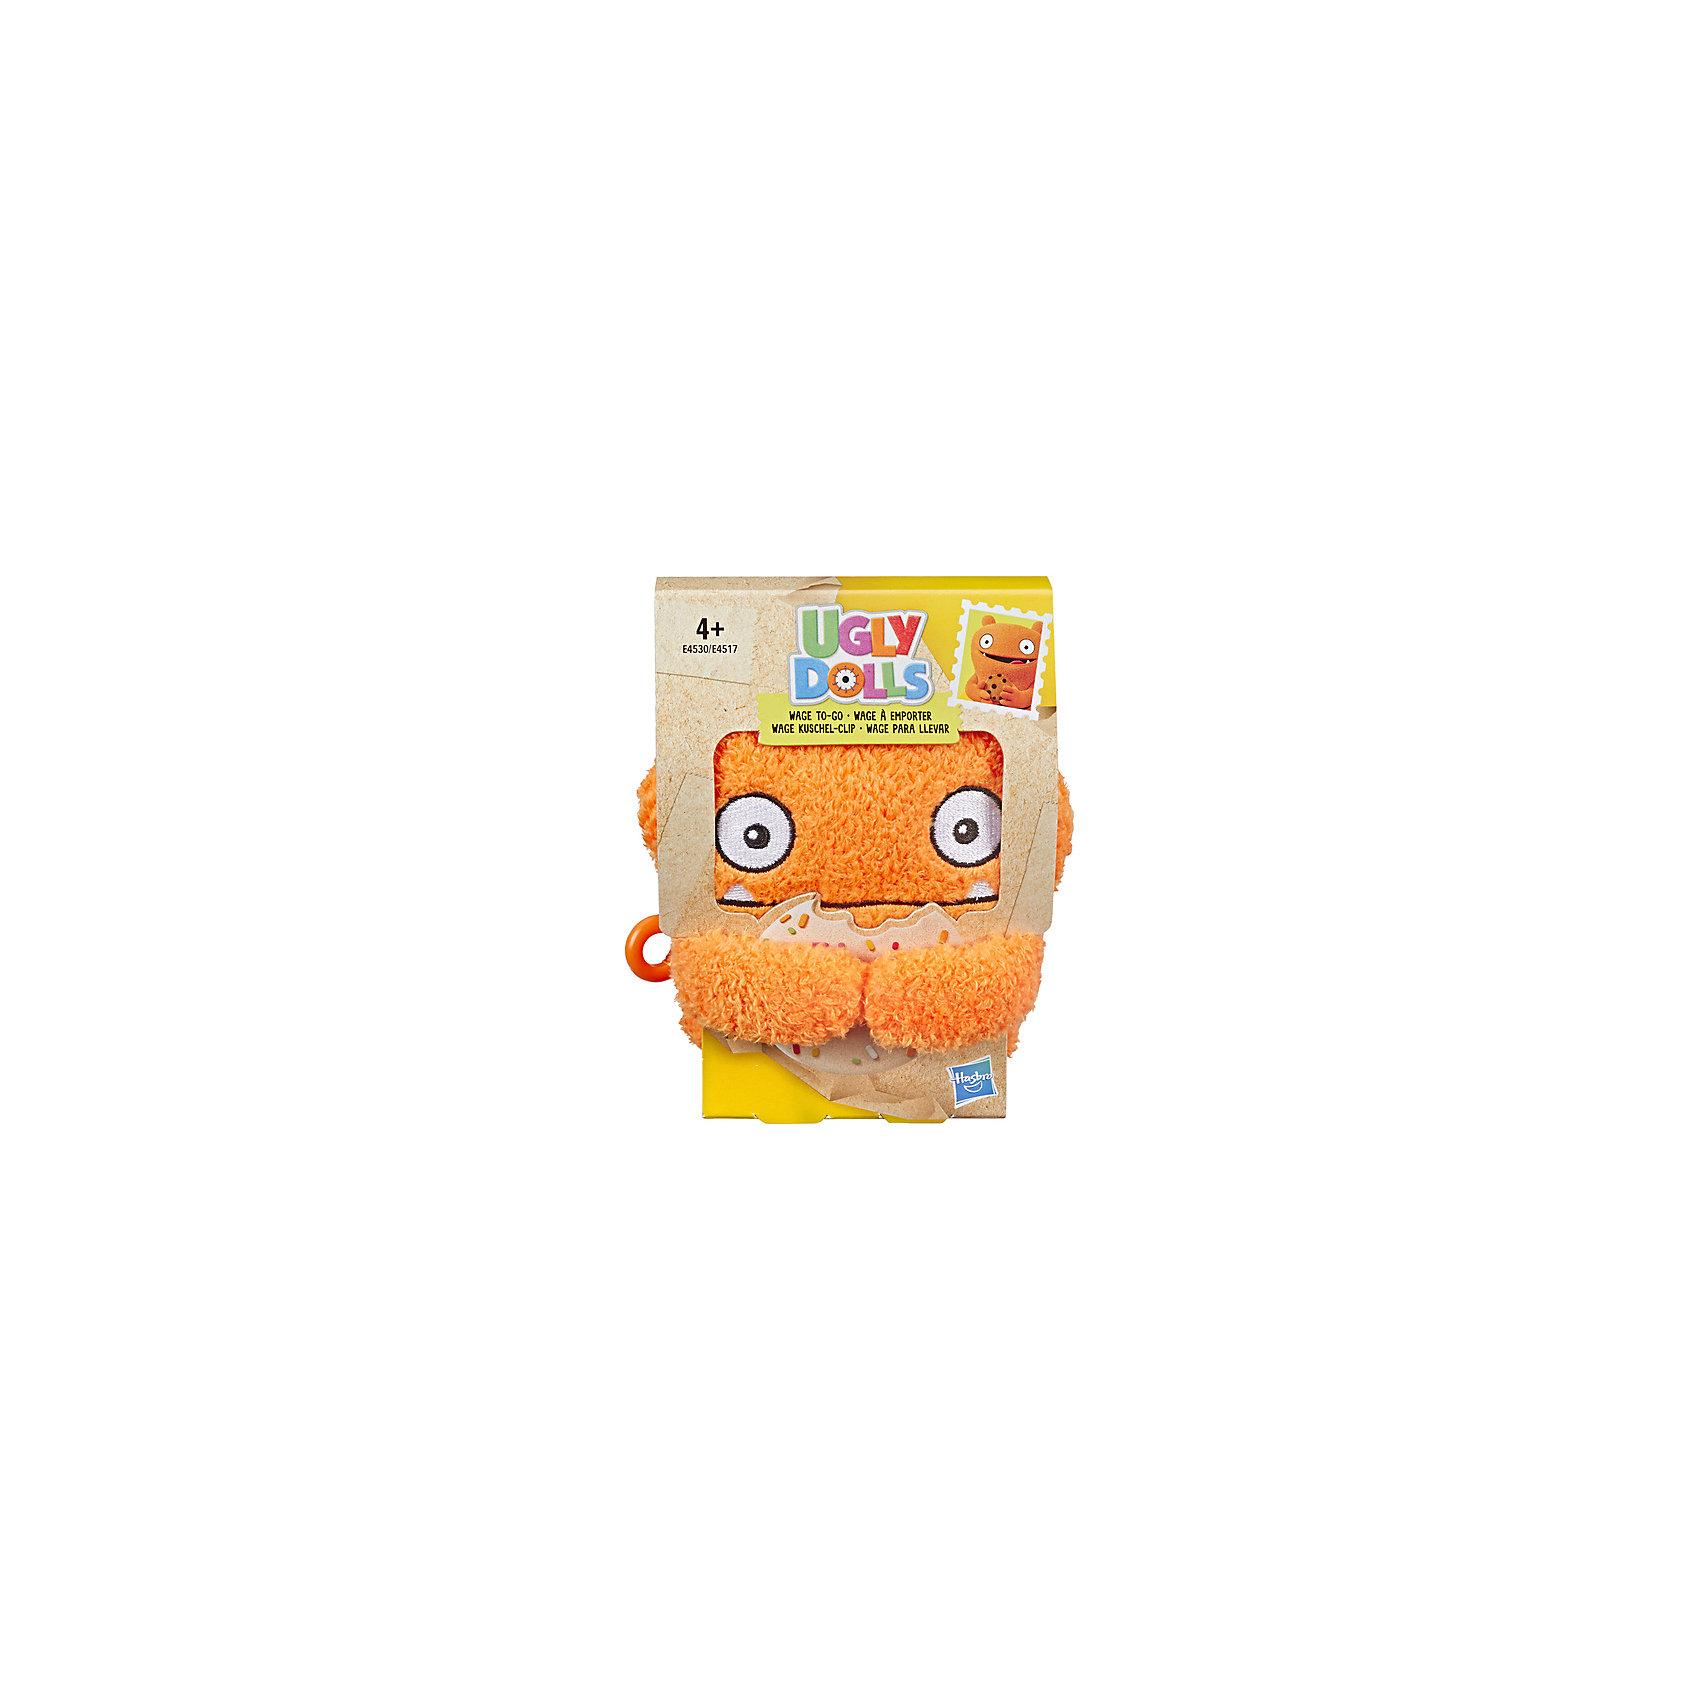 Мягкая игрушка-брелок Ugly Dolls, Вейдж